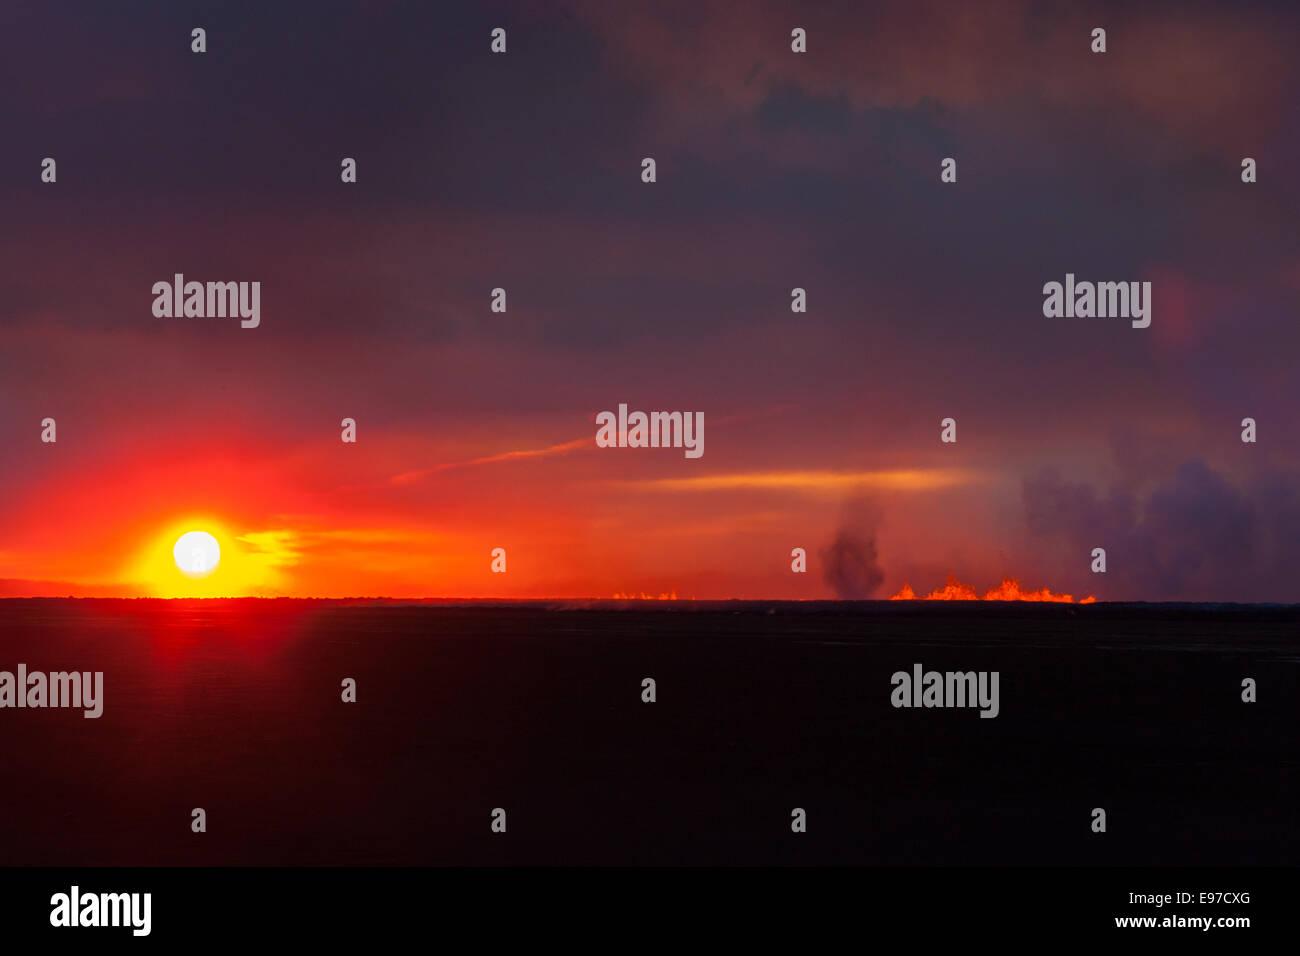 sun rise over the eruption at Holuhraun - Stock Image